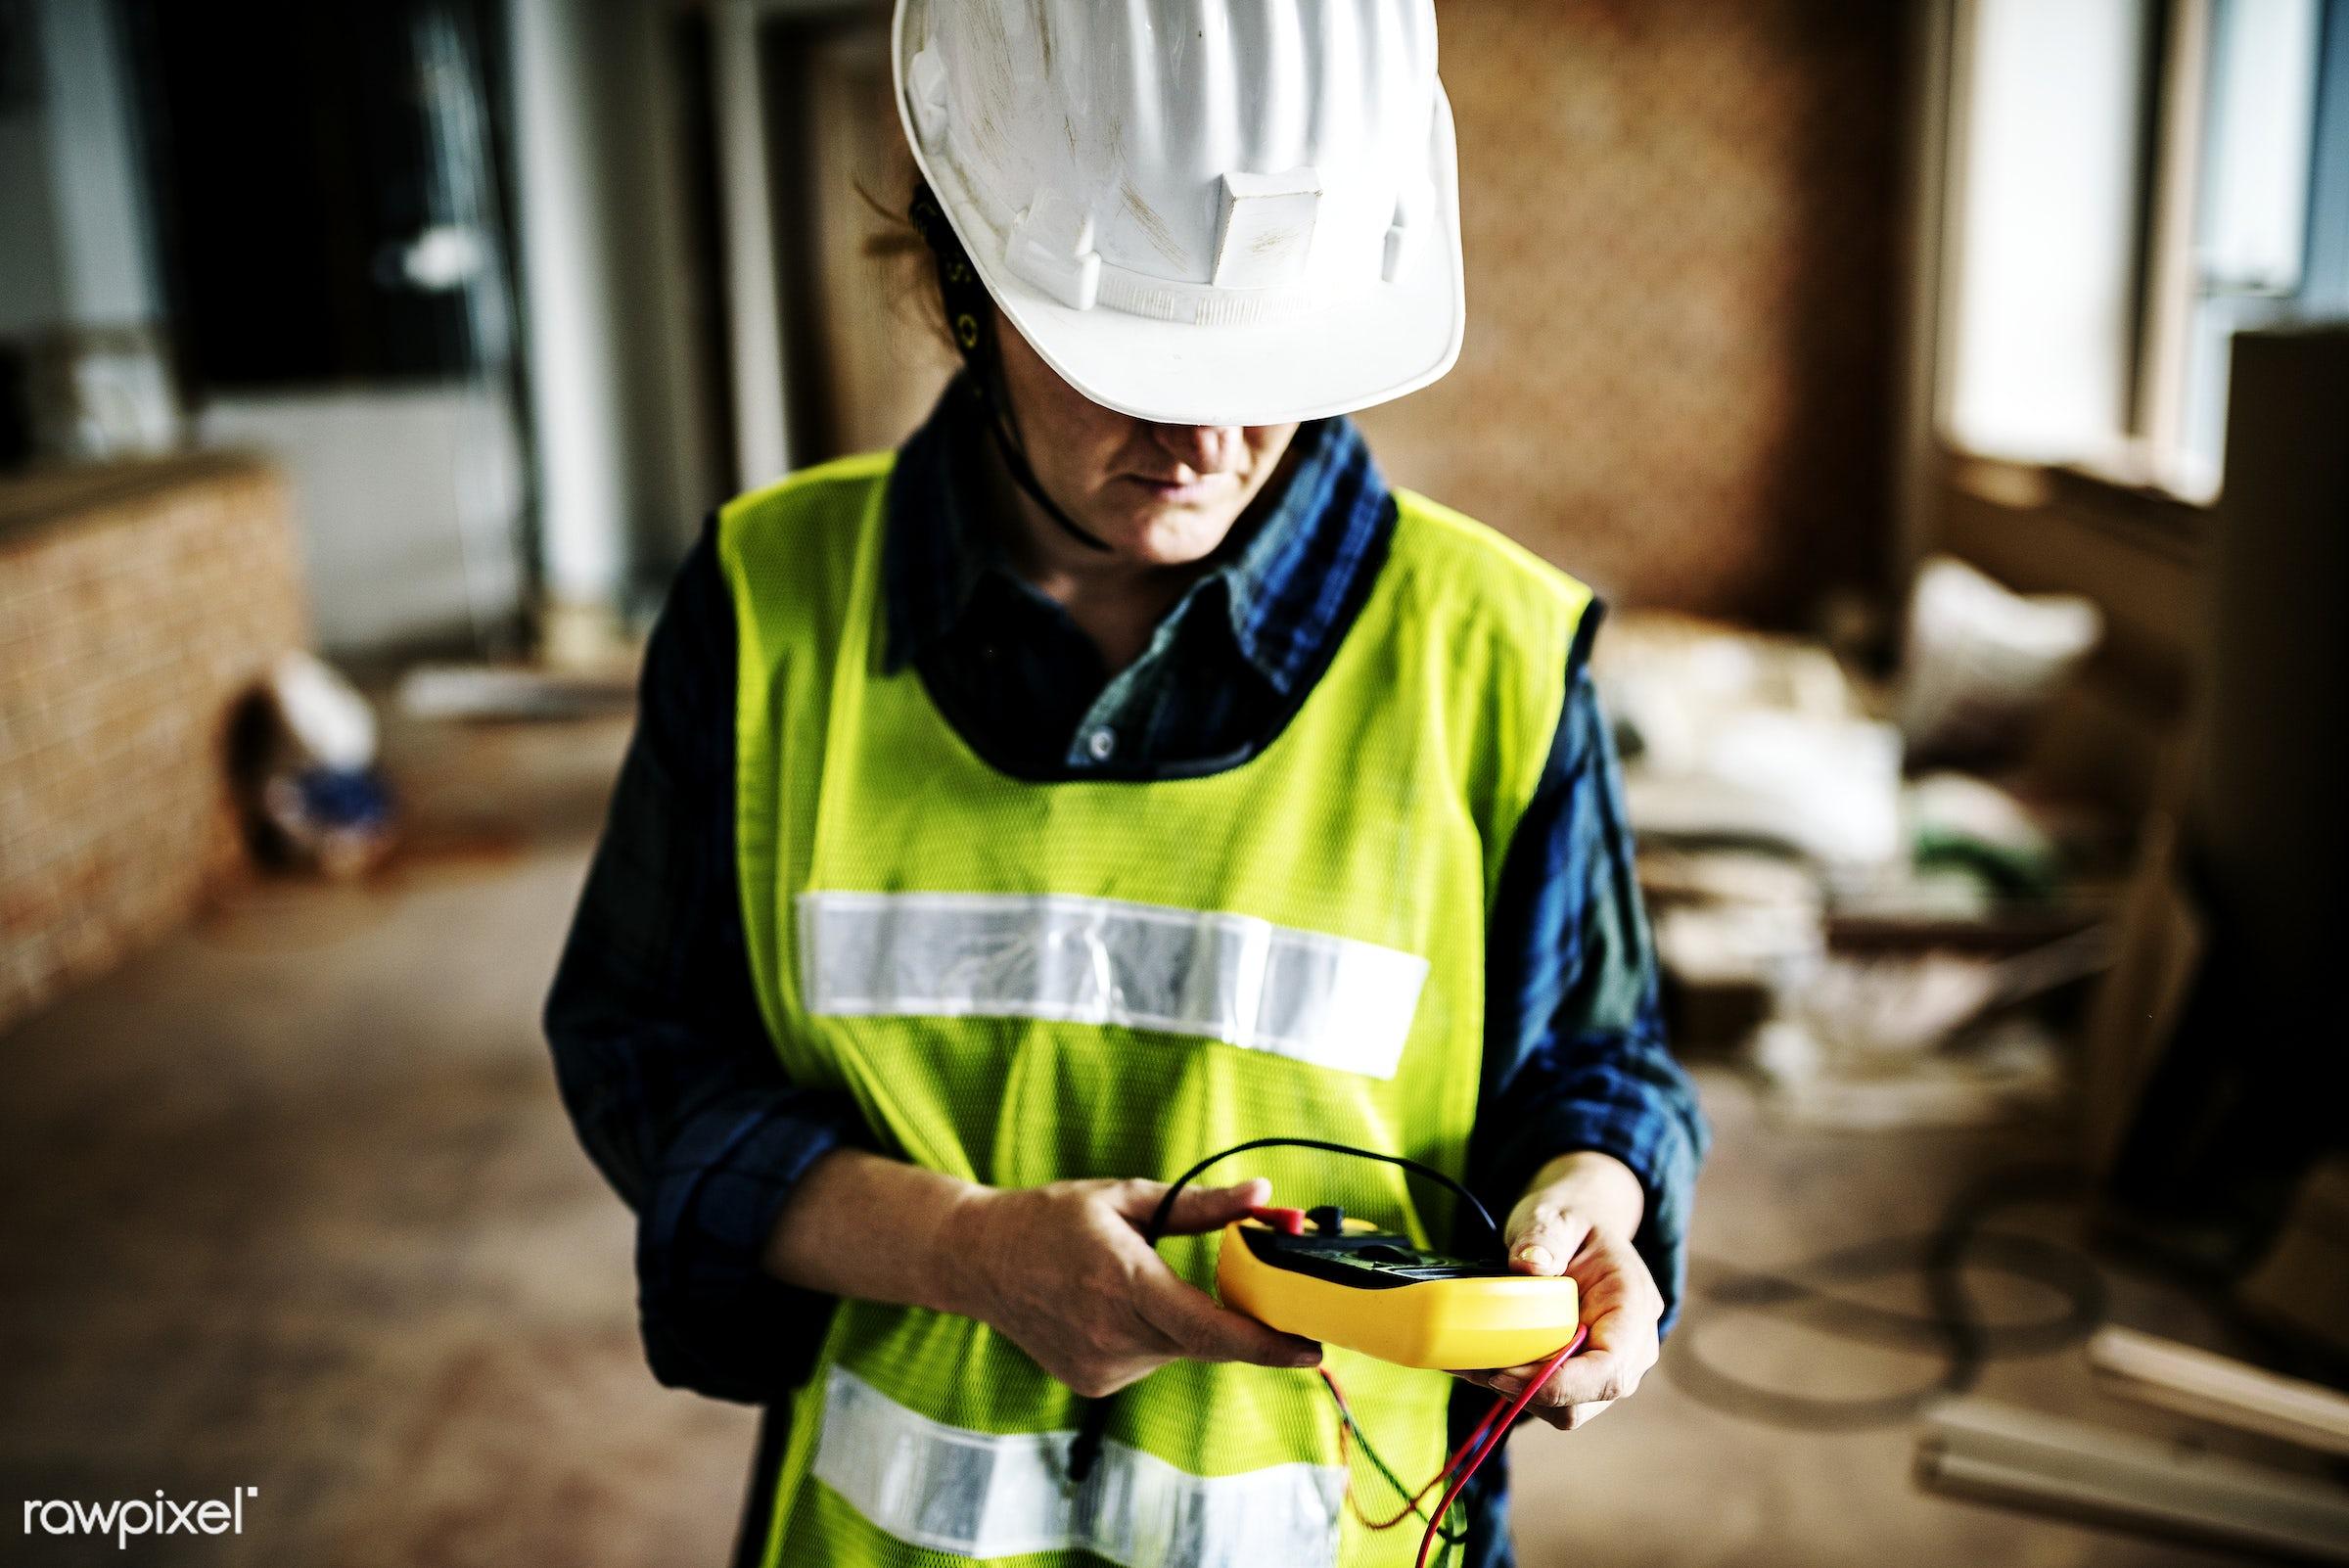 home, craft, technician, development, tool, equipment, workplace, house, technical, engineering, diy, installation,...